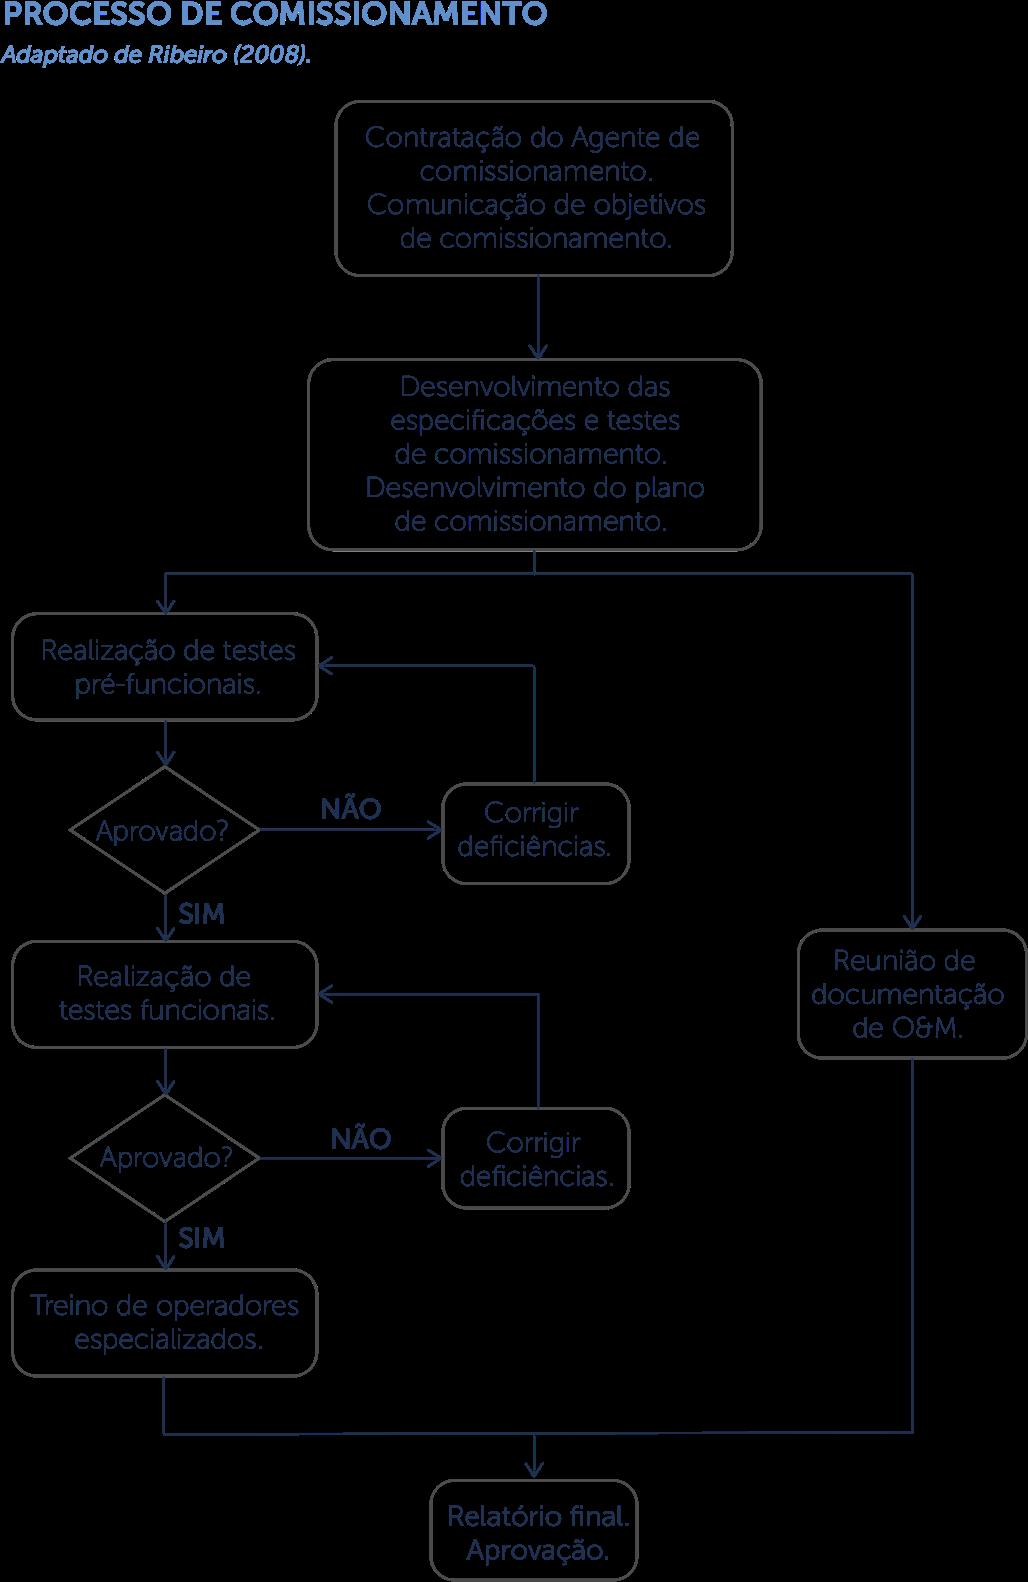 processo de comissionamento